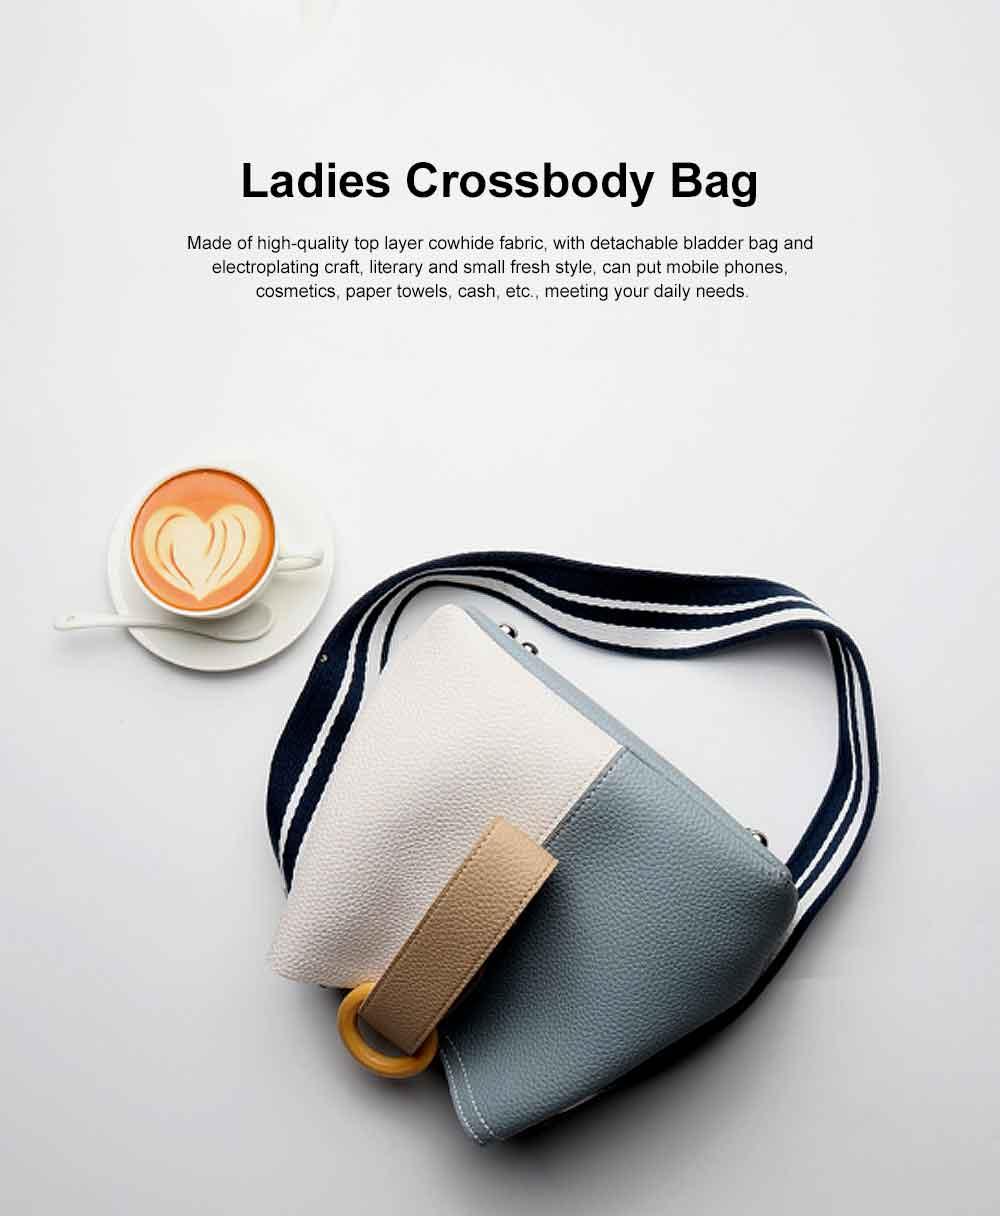 Fresh Ladies Crossbody Bag, Female Bucket Bag, with Detachable Bladder Bag 0